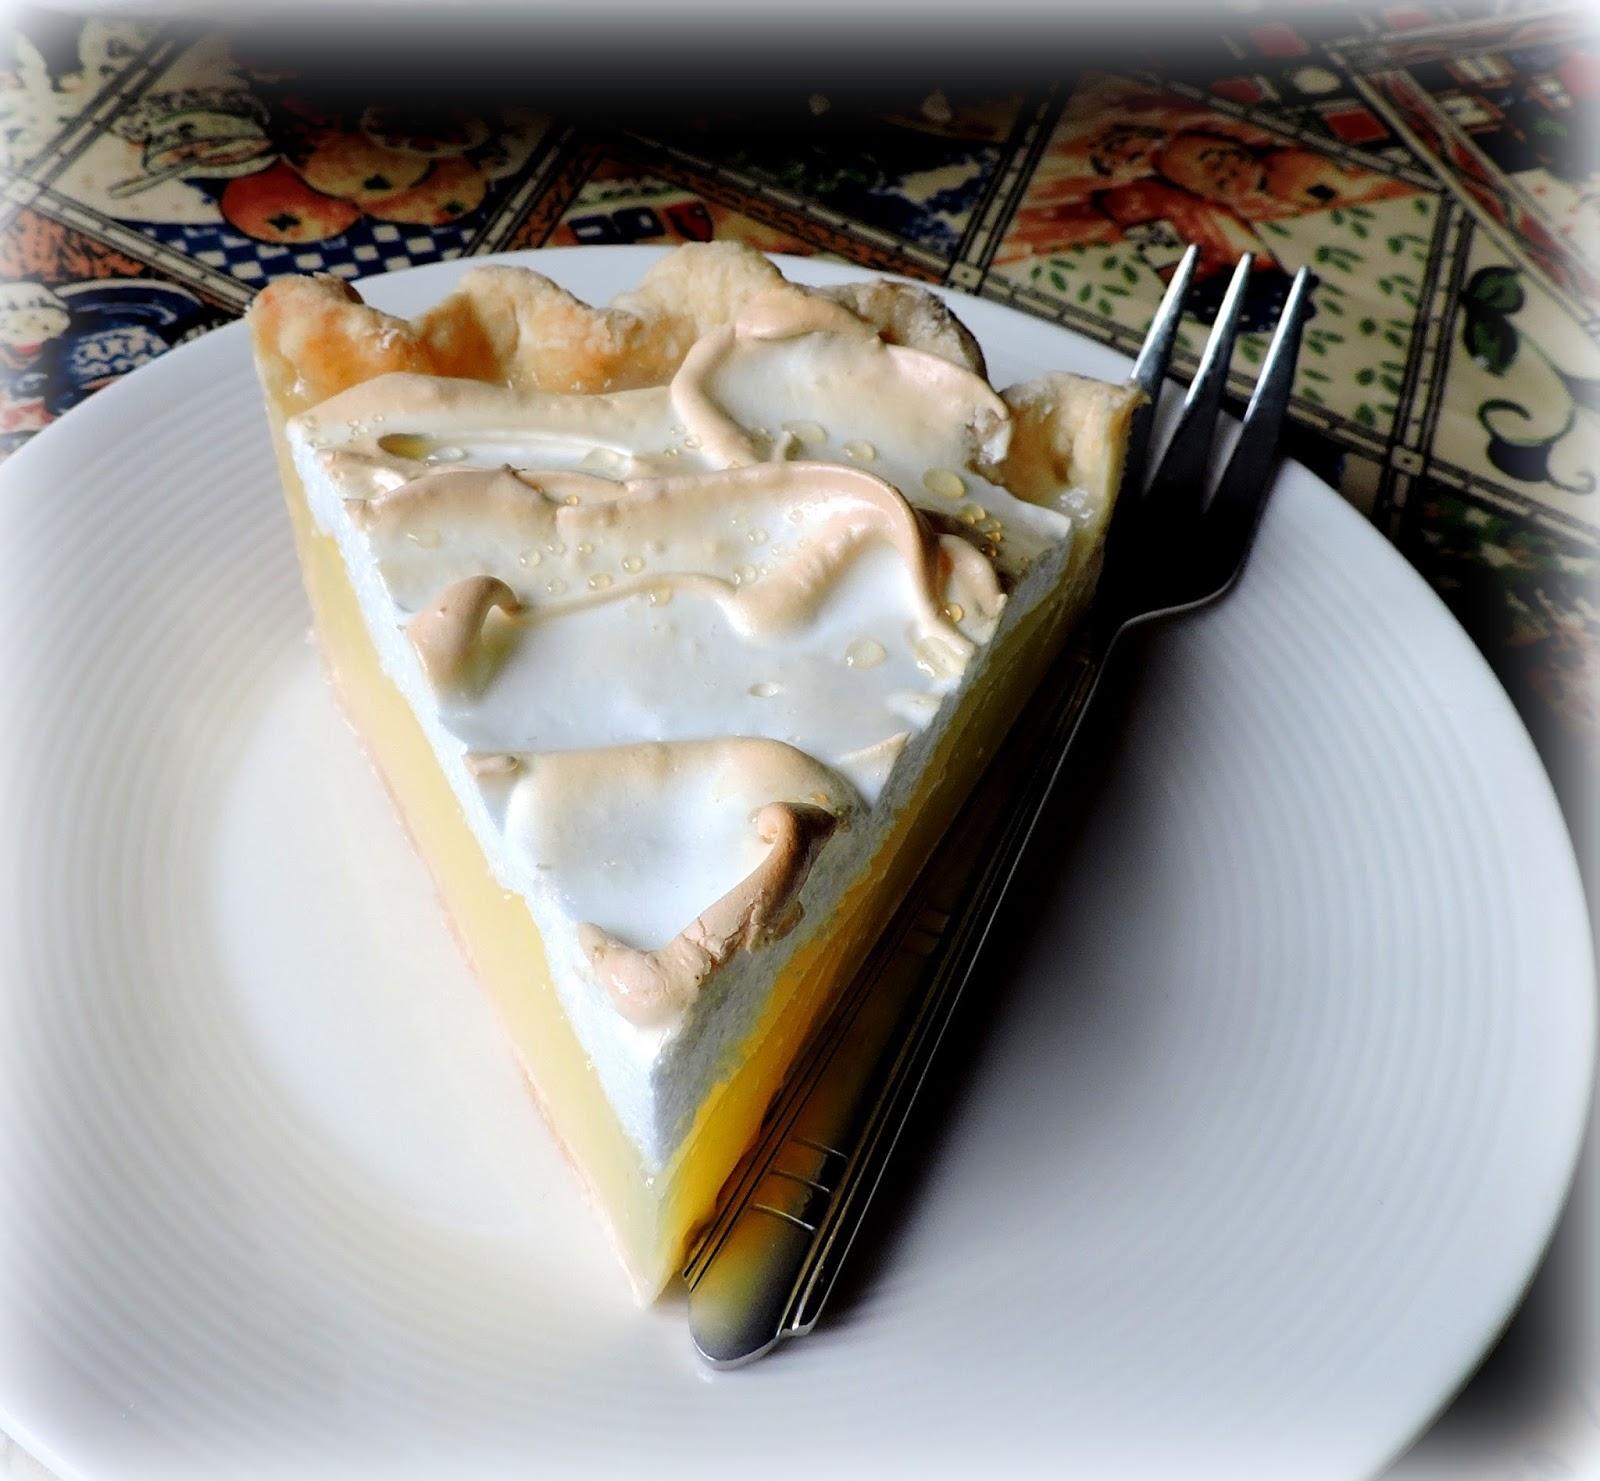 how long to cook meringue for lemon meringue pie